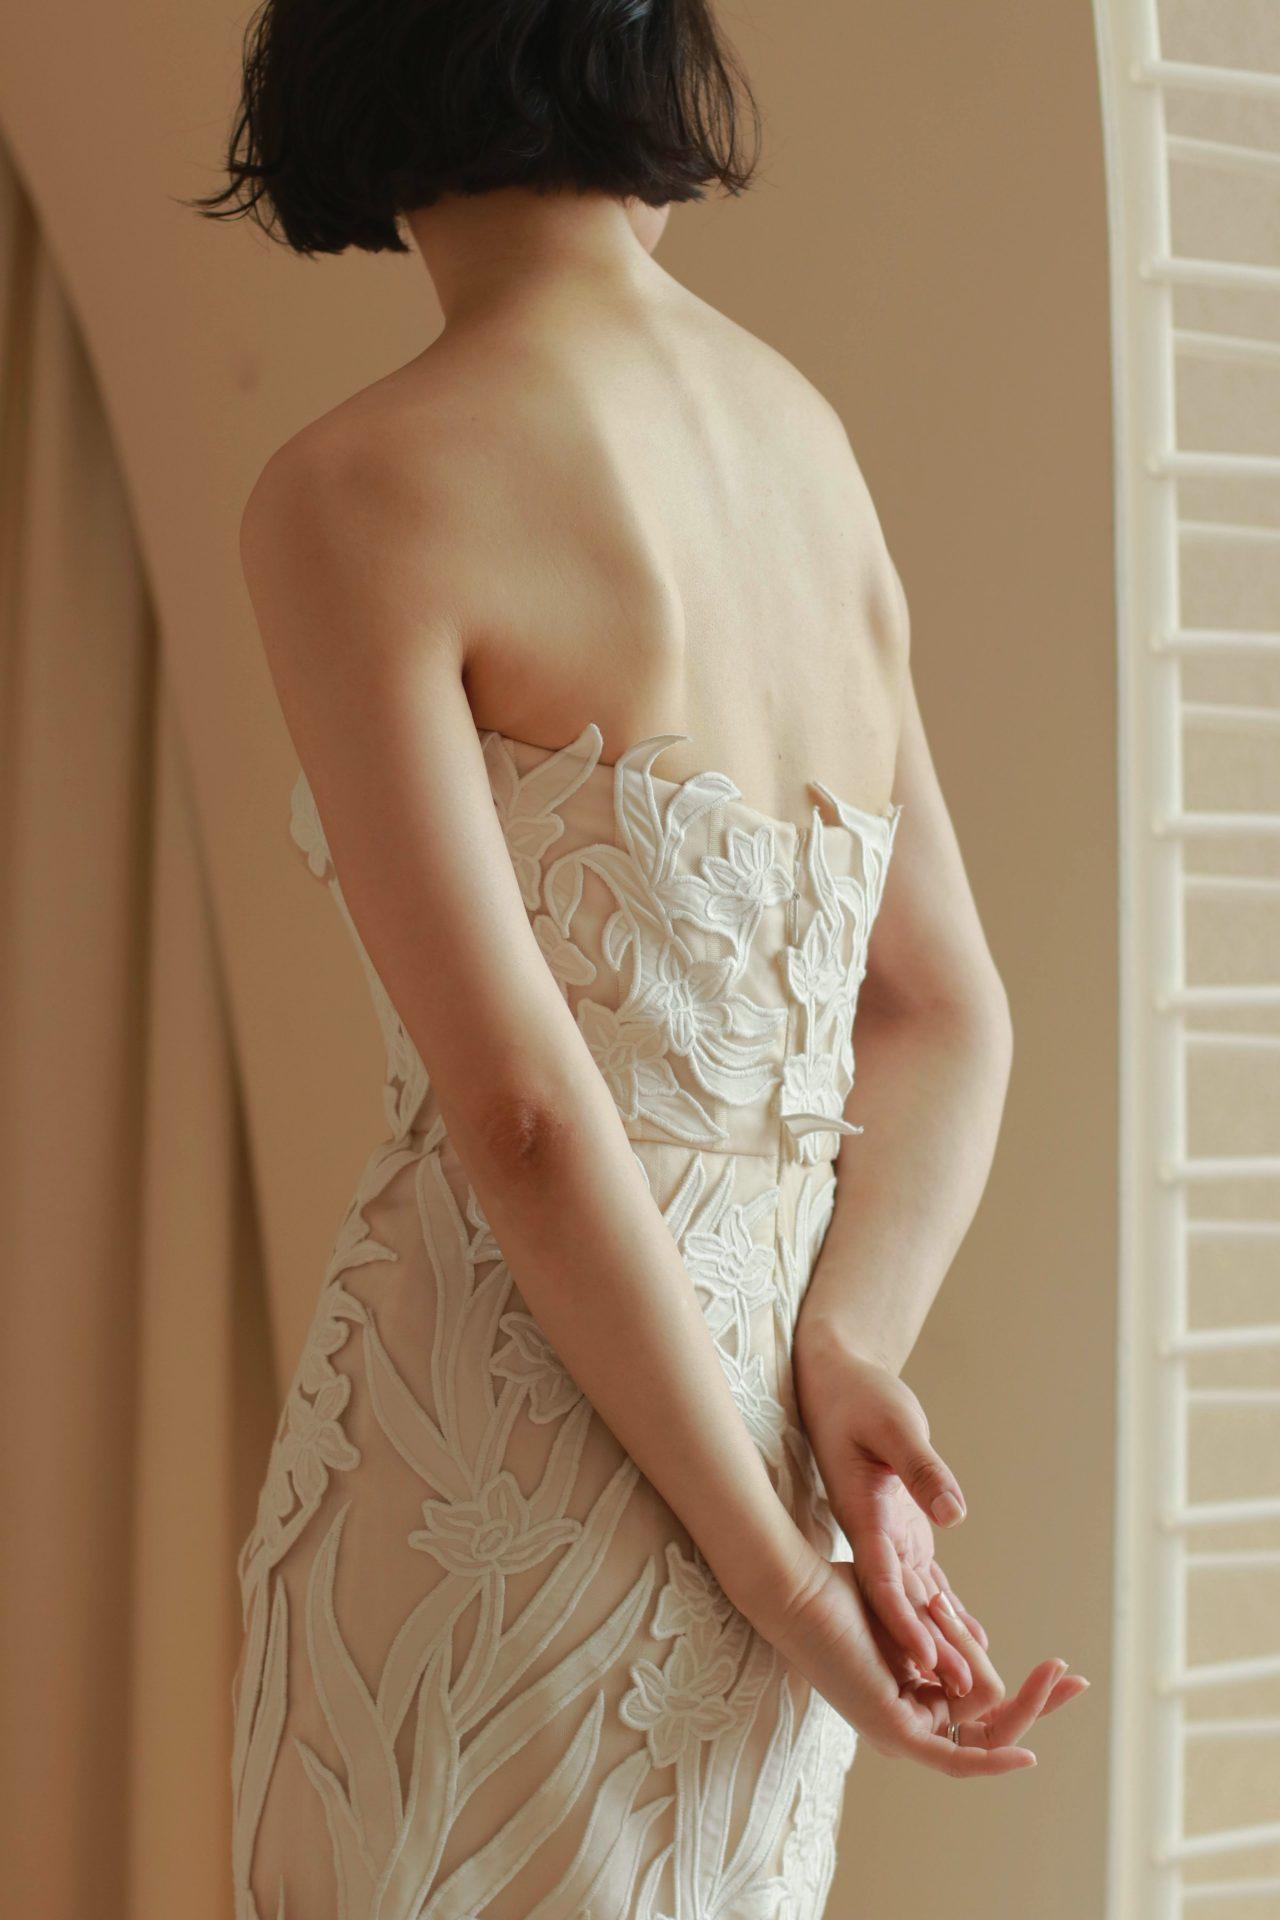 Oscar de la Rentaの2021ブライダルコレクションより入荷した新作ドレスは、大振りなレースが印象的なモダンなデザインです